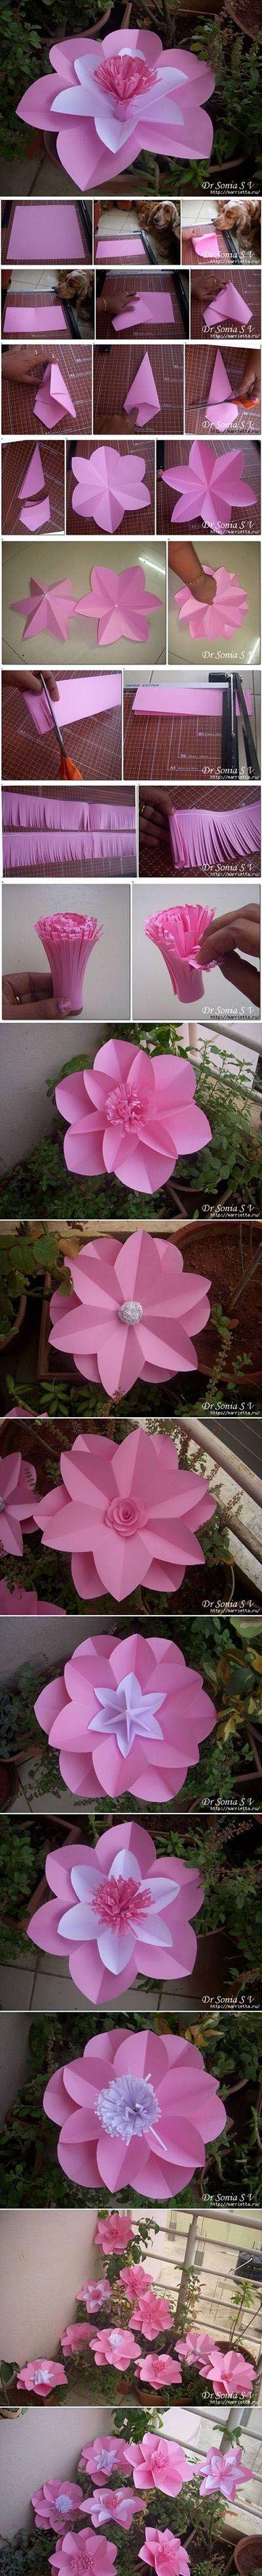 Diy Beautiful Pink Flower | DIY & Crafts Tutorials